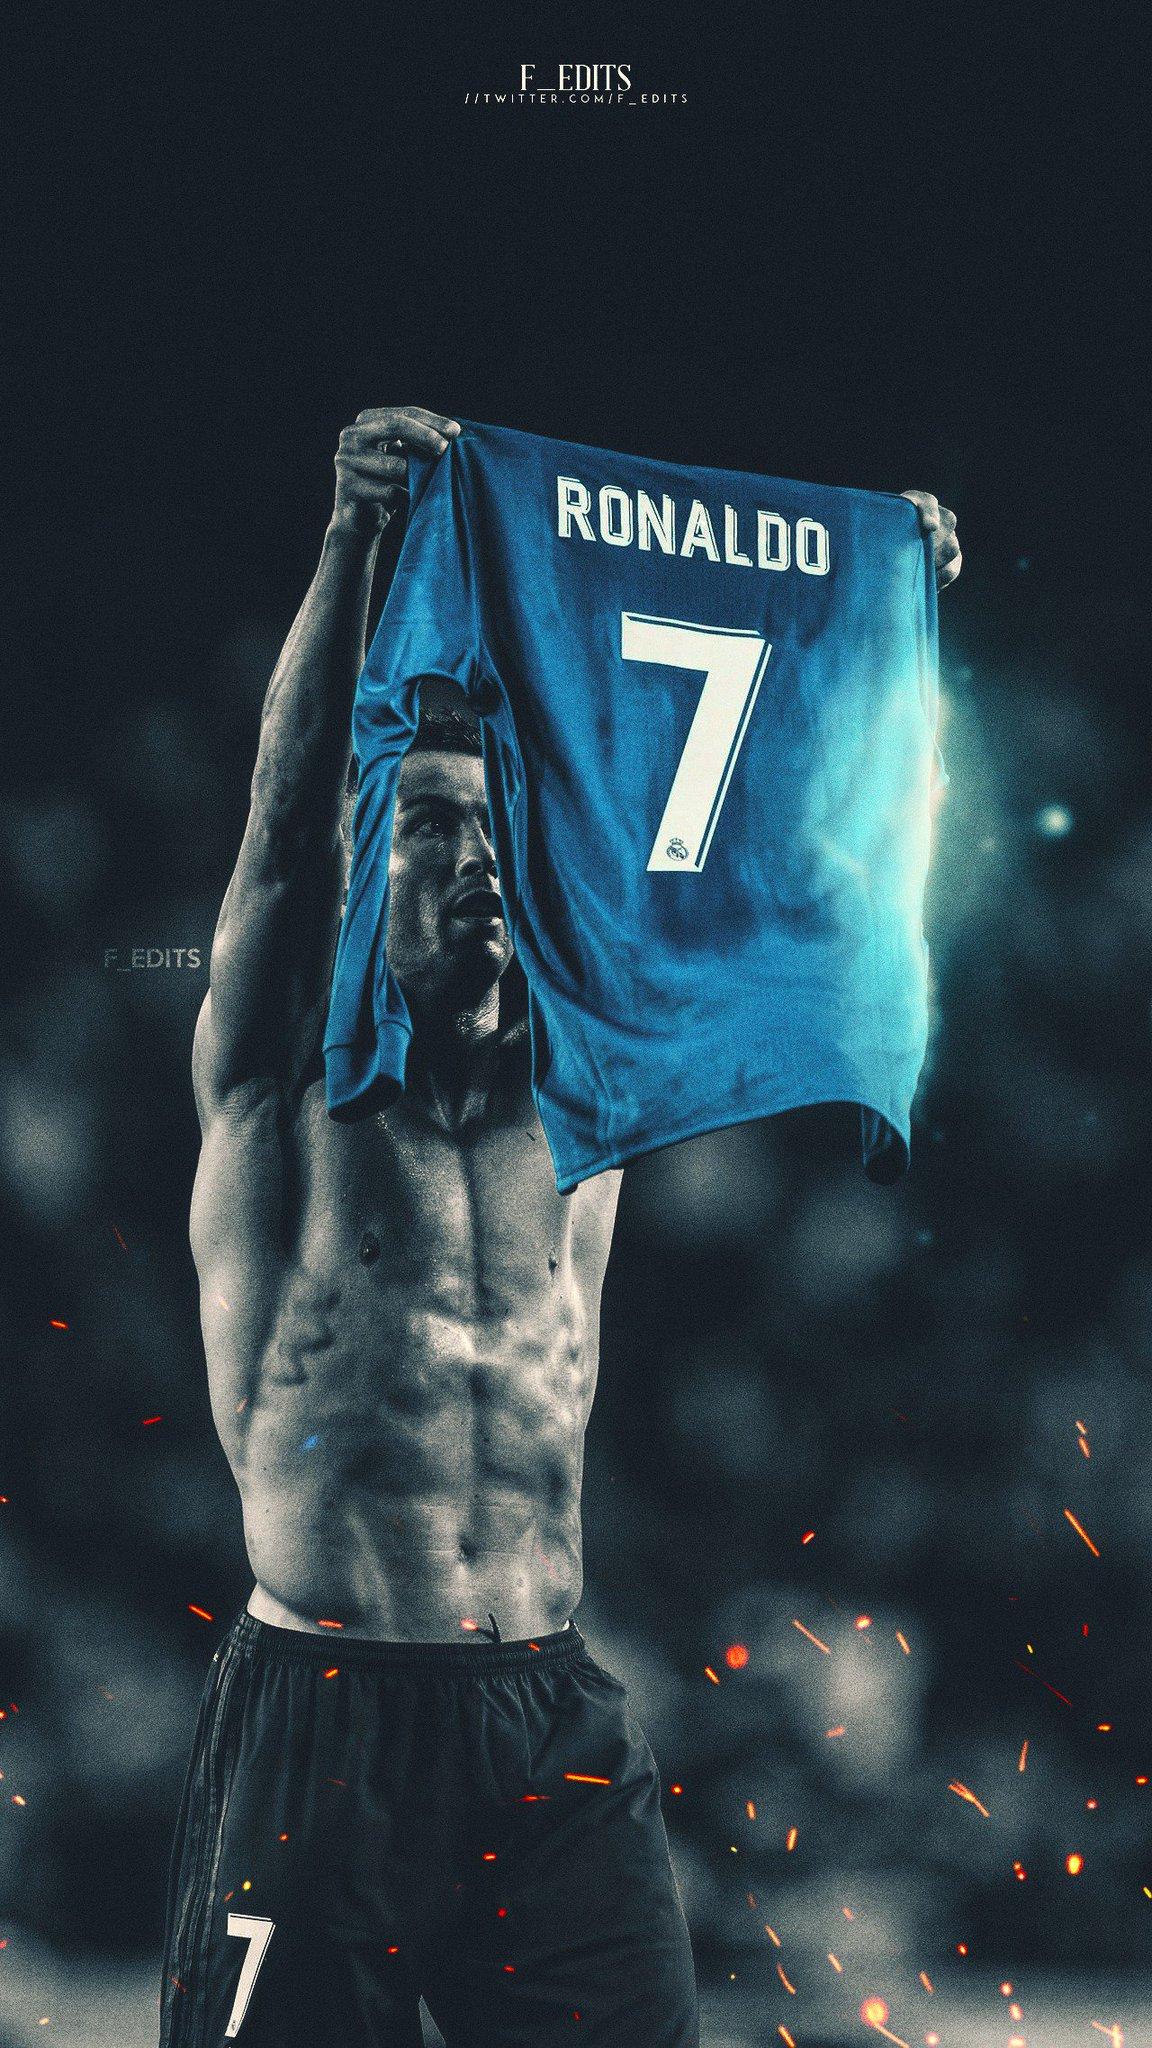 Football edits on twitter cristiano ronaldo elclassico for Fondos de pantalla de futbol